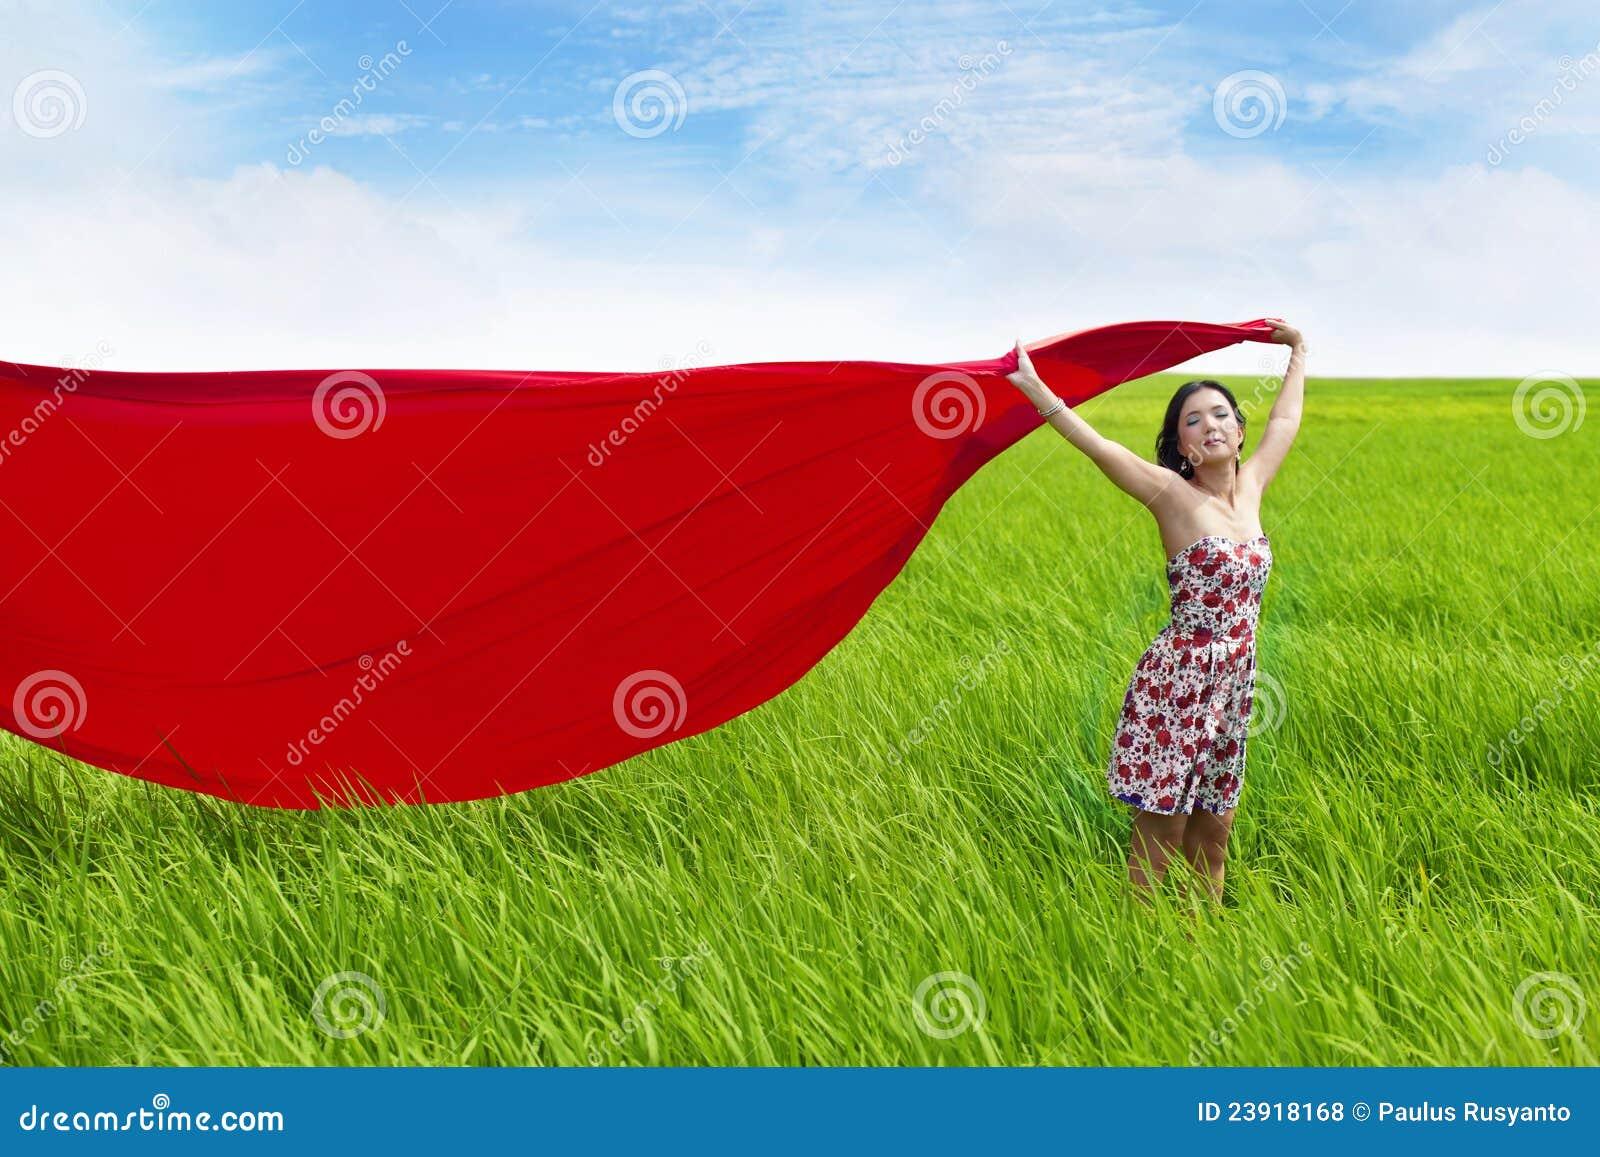 Sorglose Frau mit rotem Schal auf Reisfeld